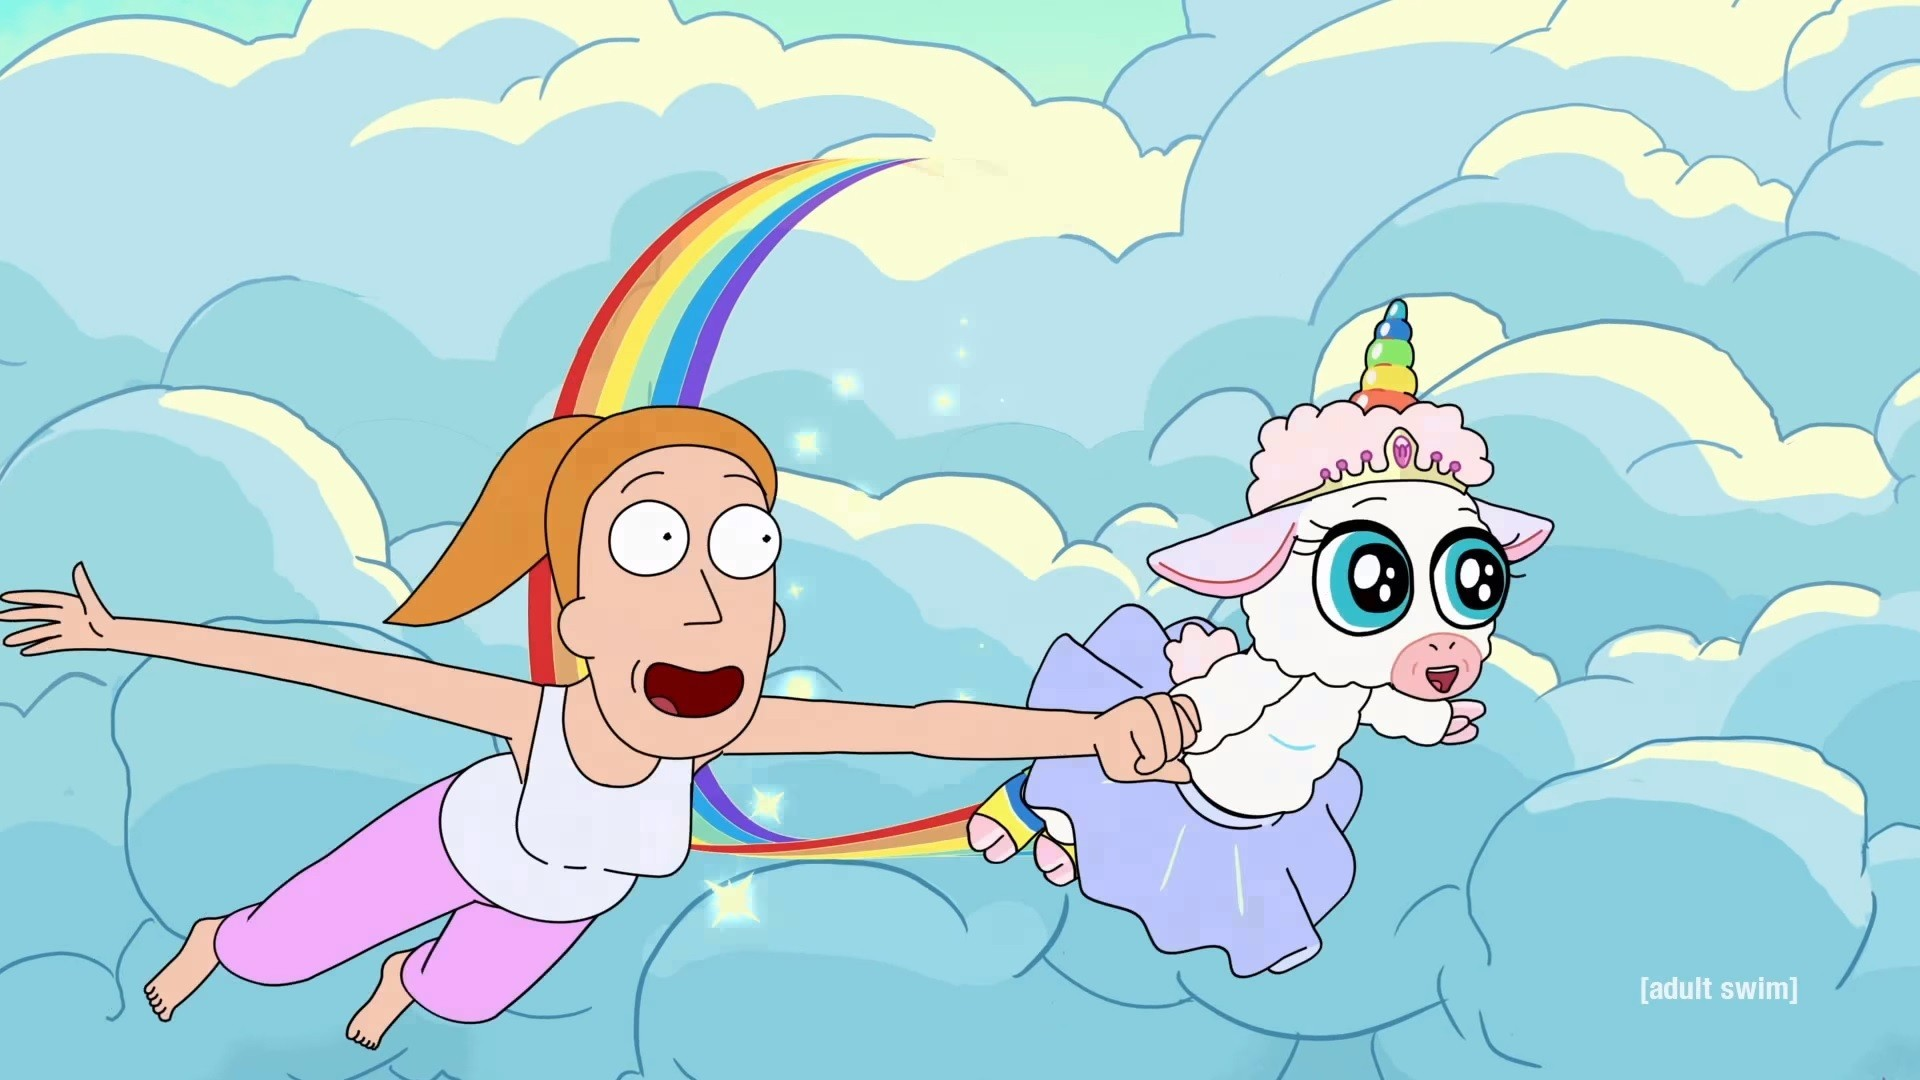 Create Comics Meme Summer Smith Rick And Morty Rick And Morty Summer Feet Rick And Morty Jerry Comics Meme Arsenal Com